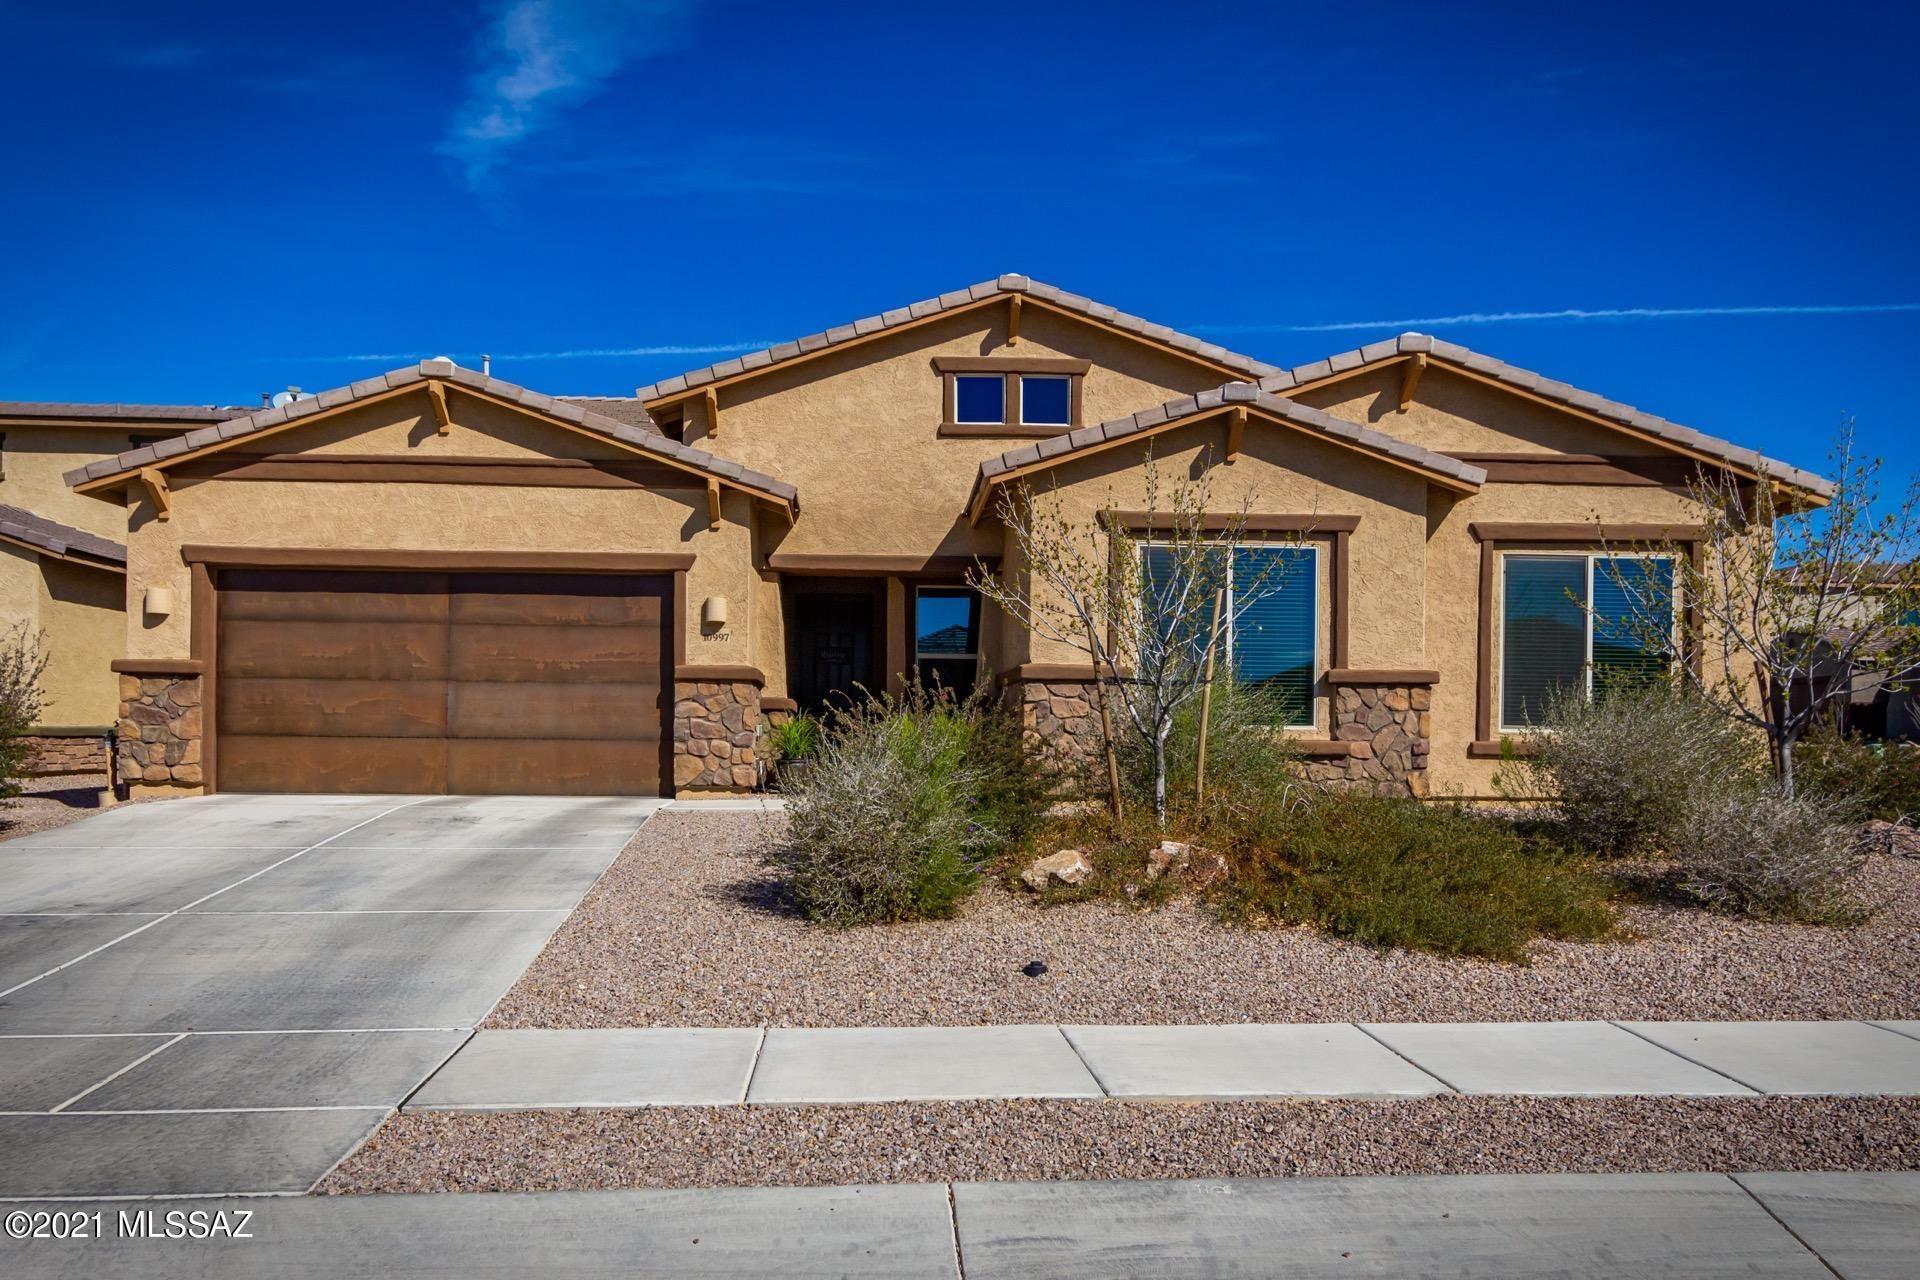 10997 N Delphinus Street, Oro Valley, AZ 85742 - MLS#: 22105000